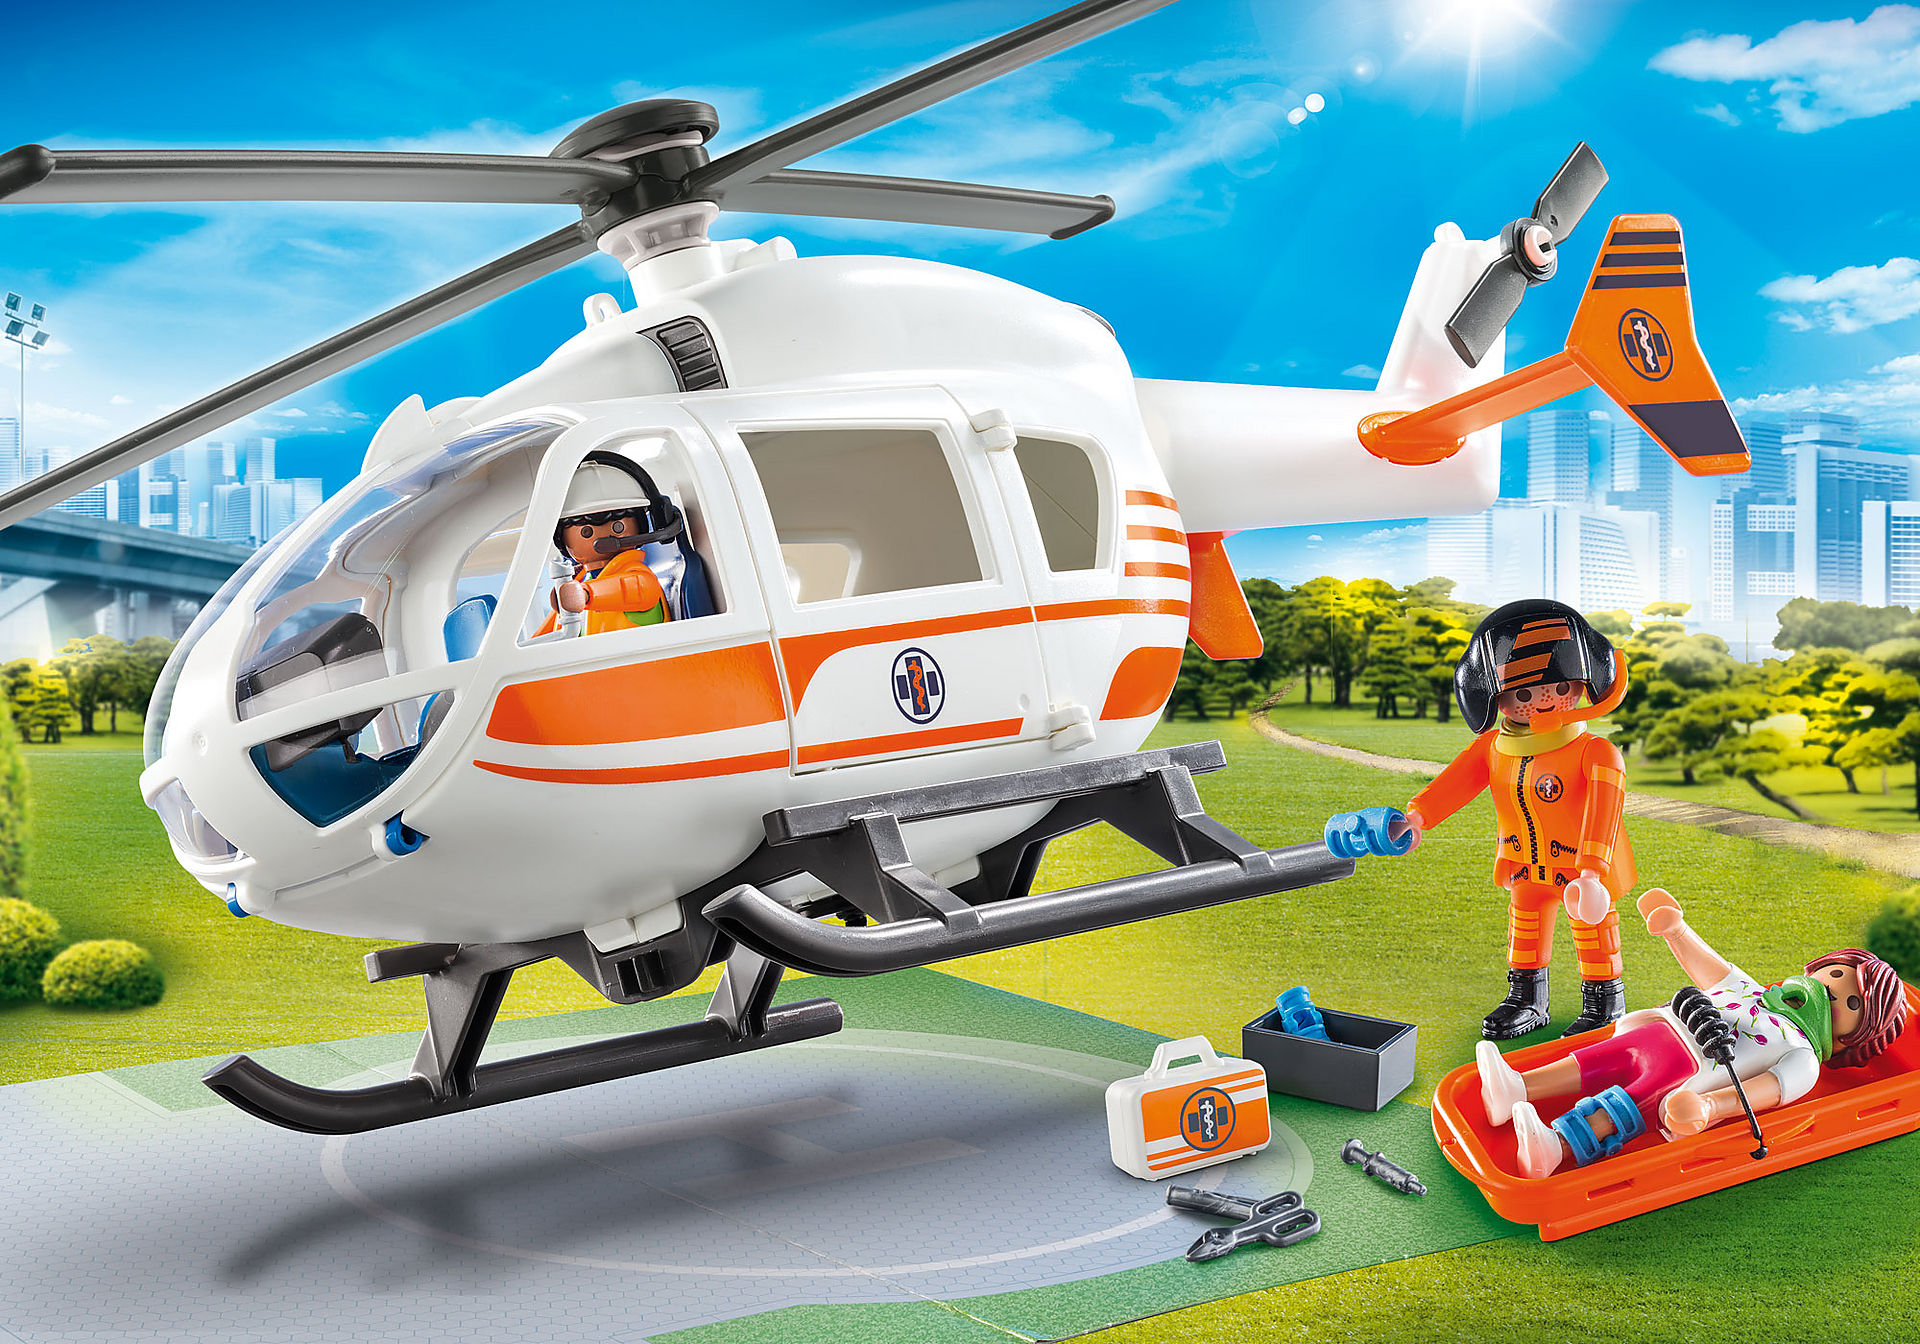 70048 Redningshelikopter zoom image1